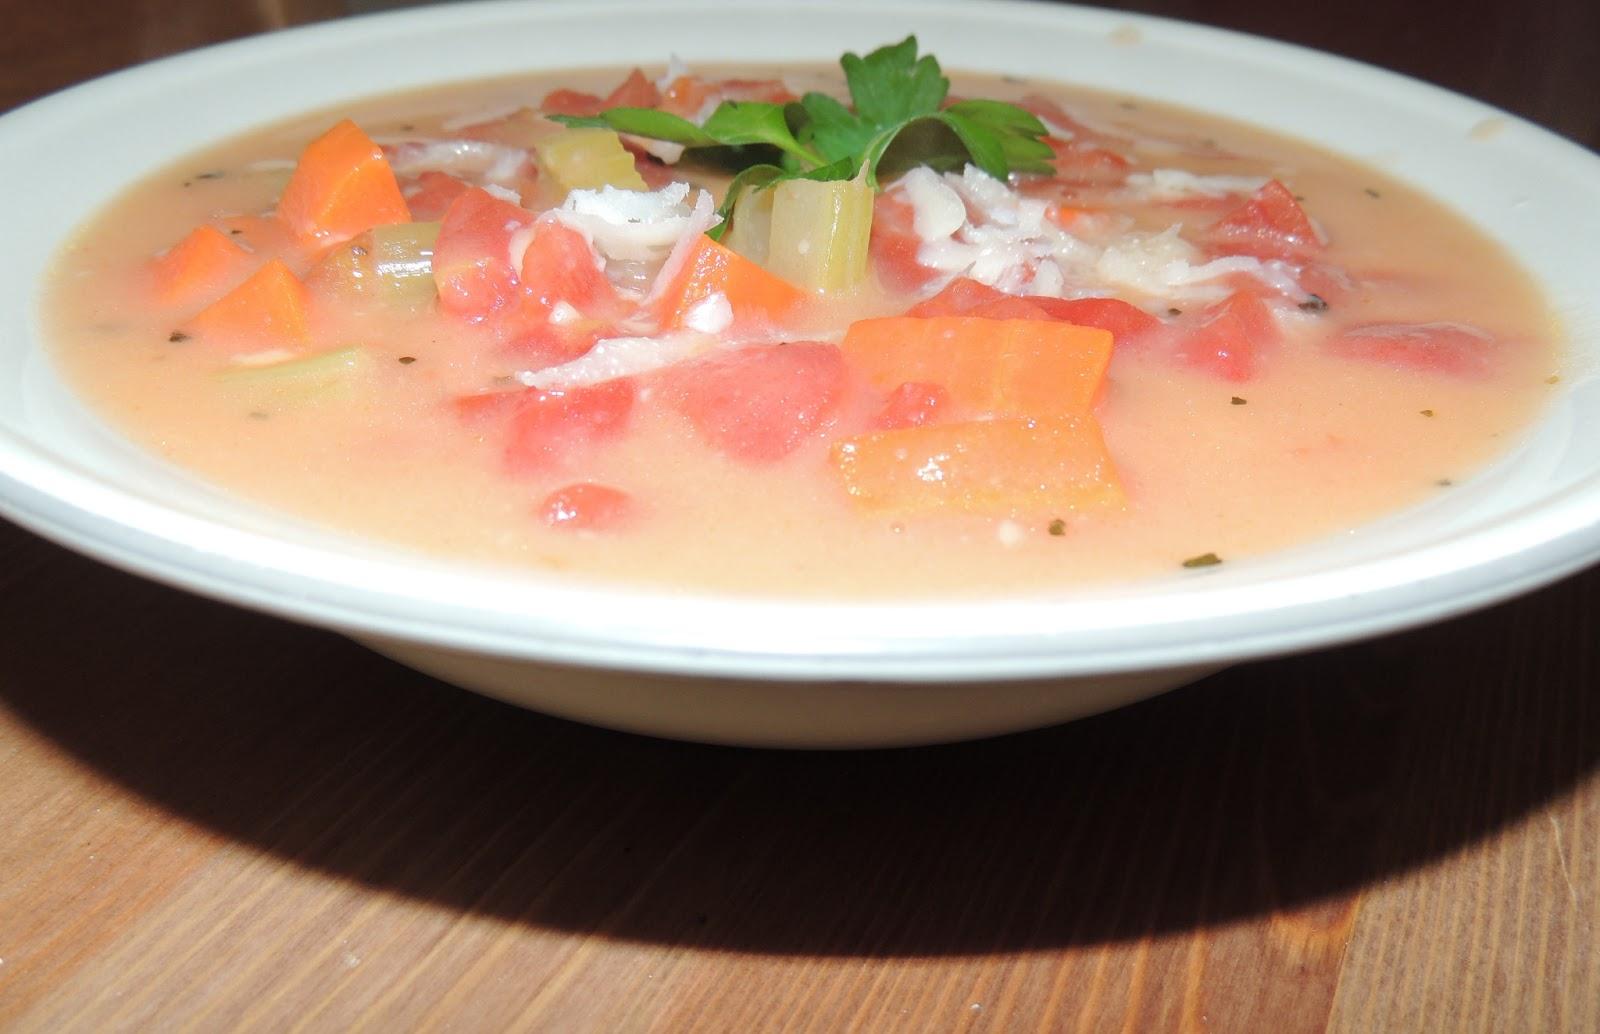 Gas Stove Girl: Creamy Tomato Parmesan Soup